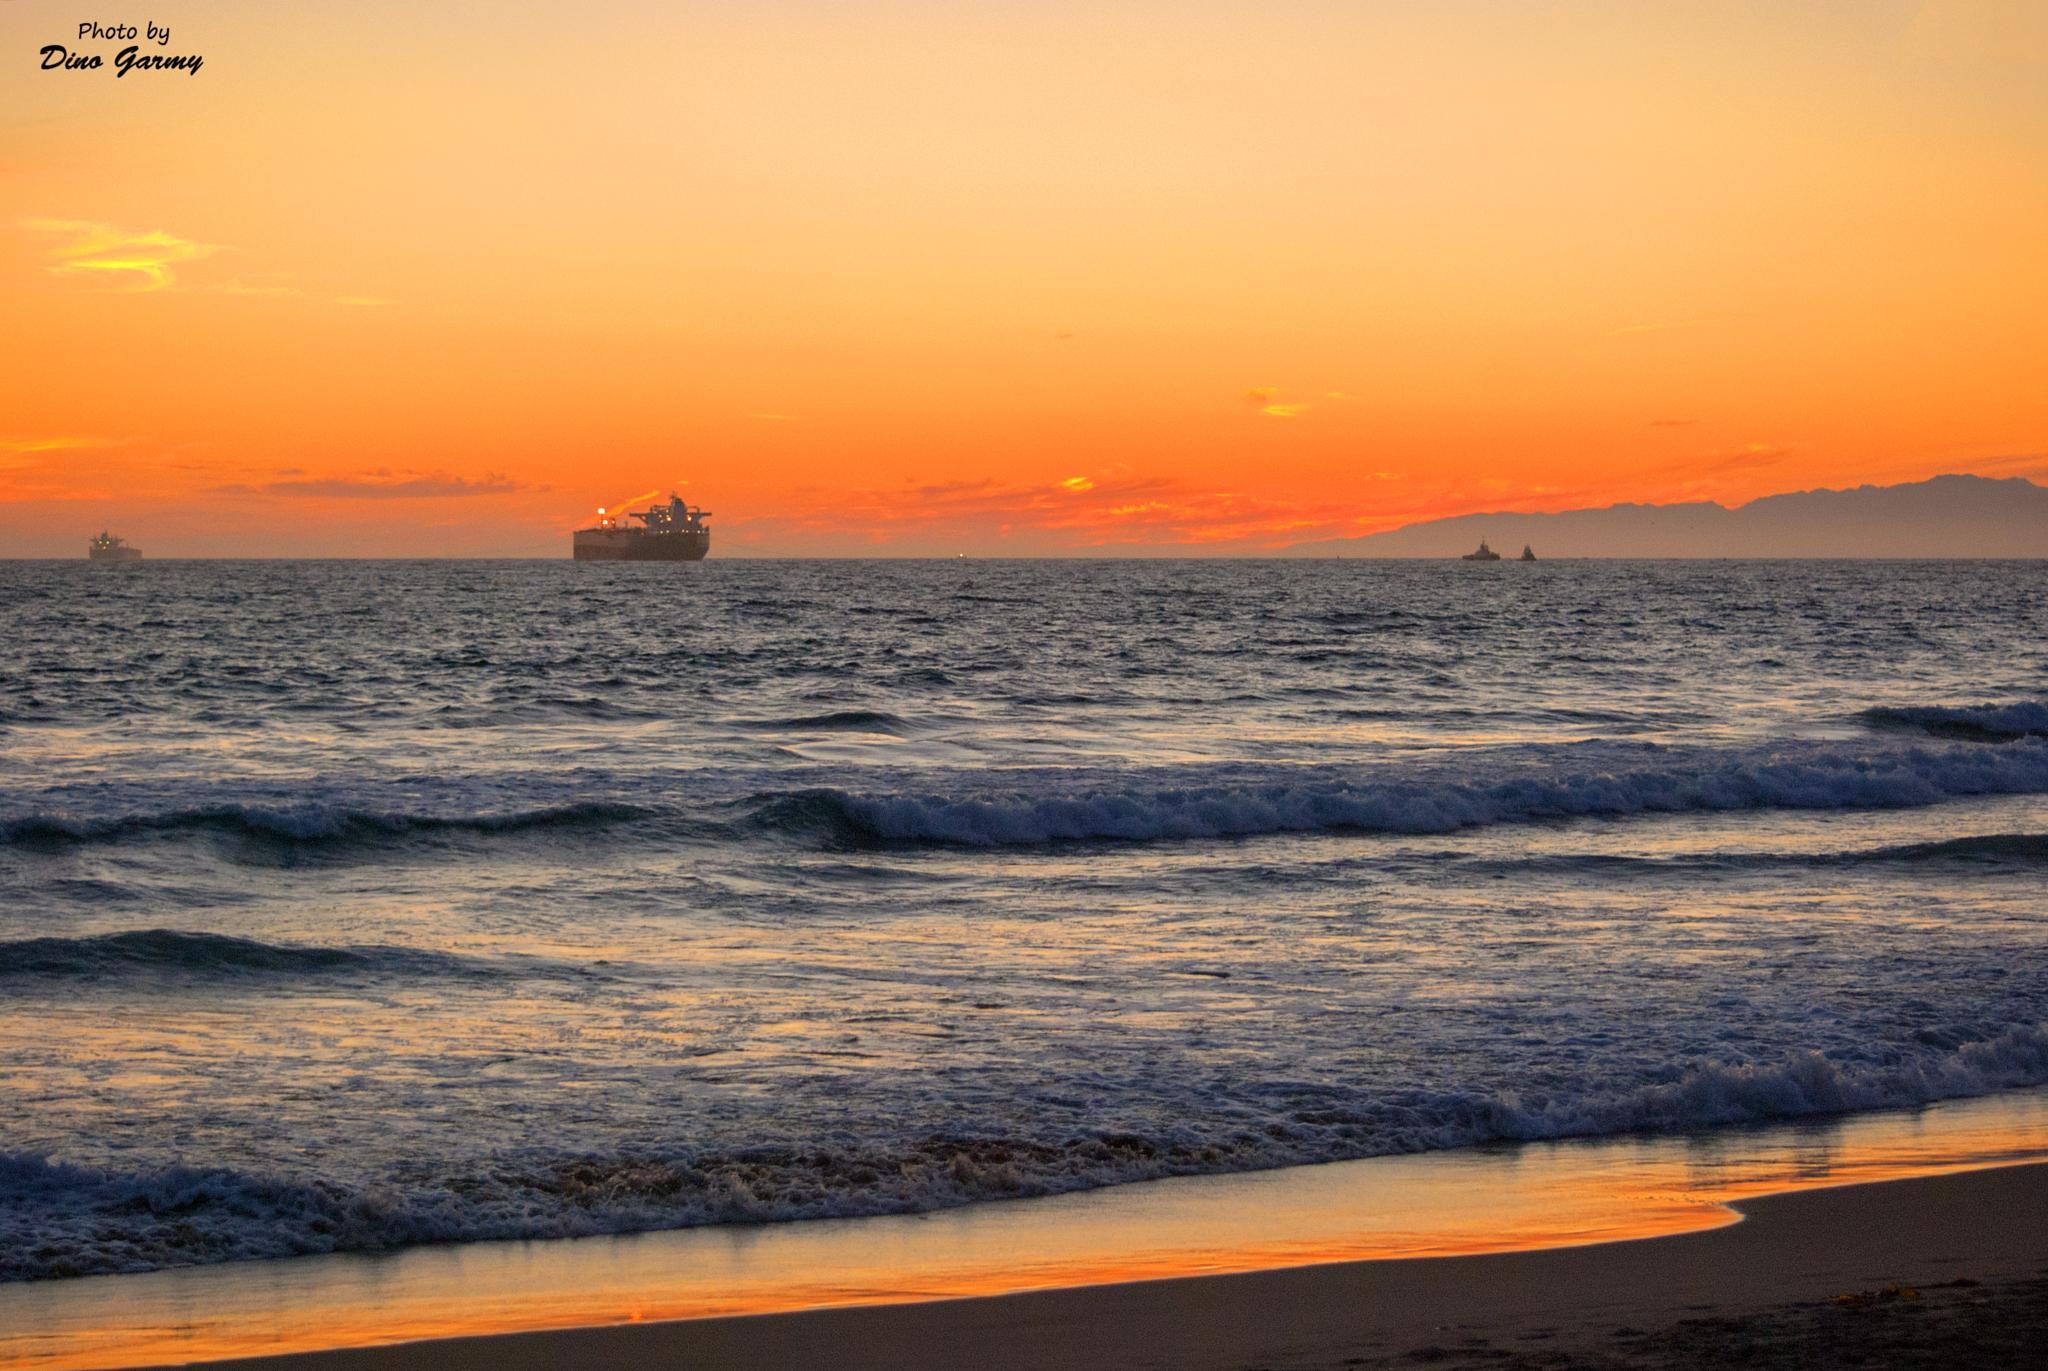 Manhattan beach sunset by Dino